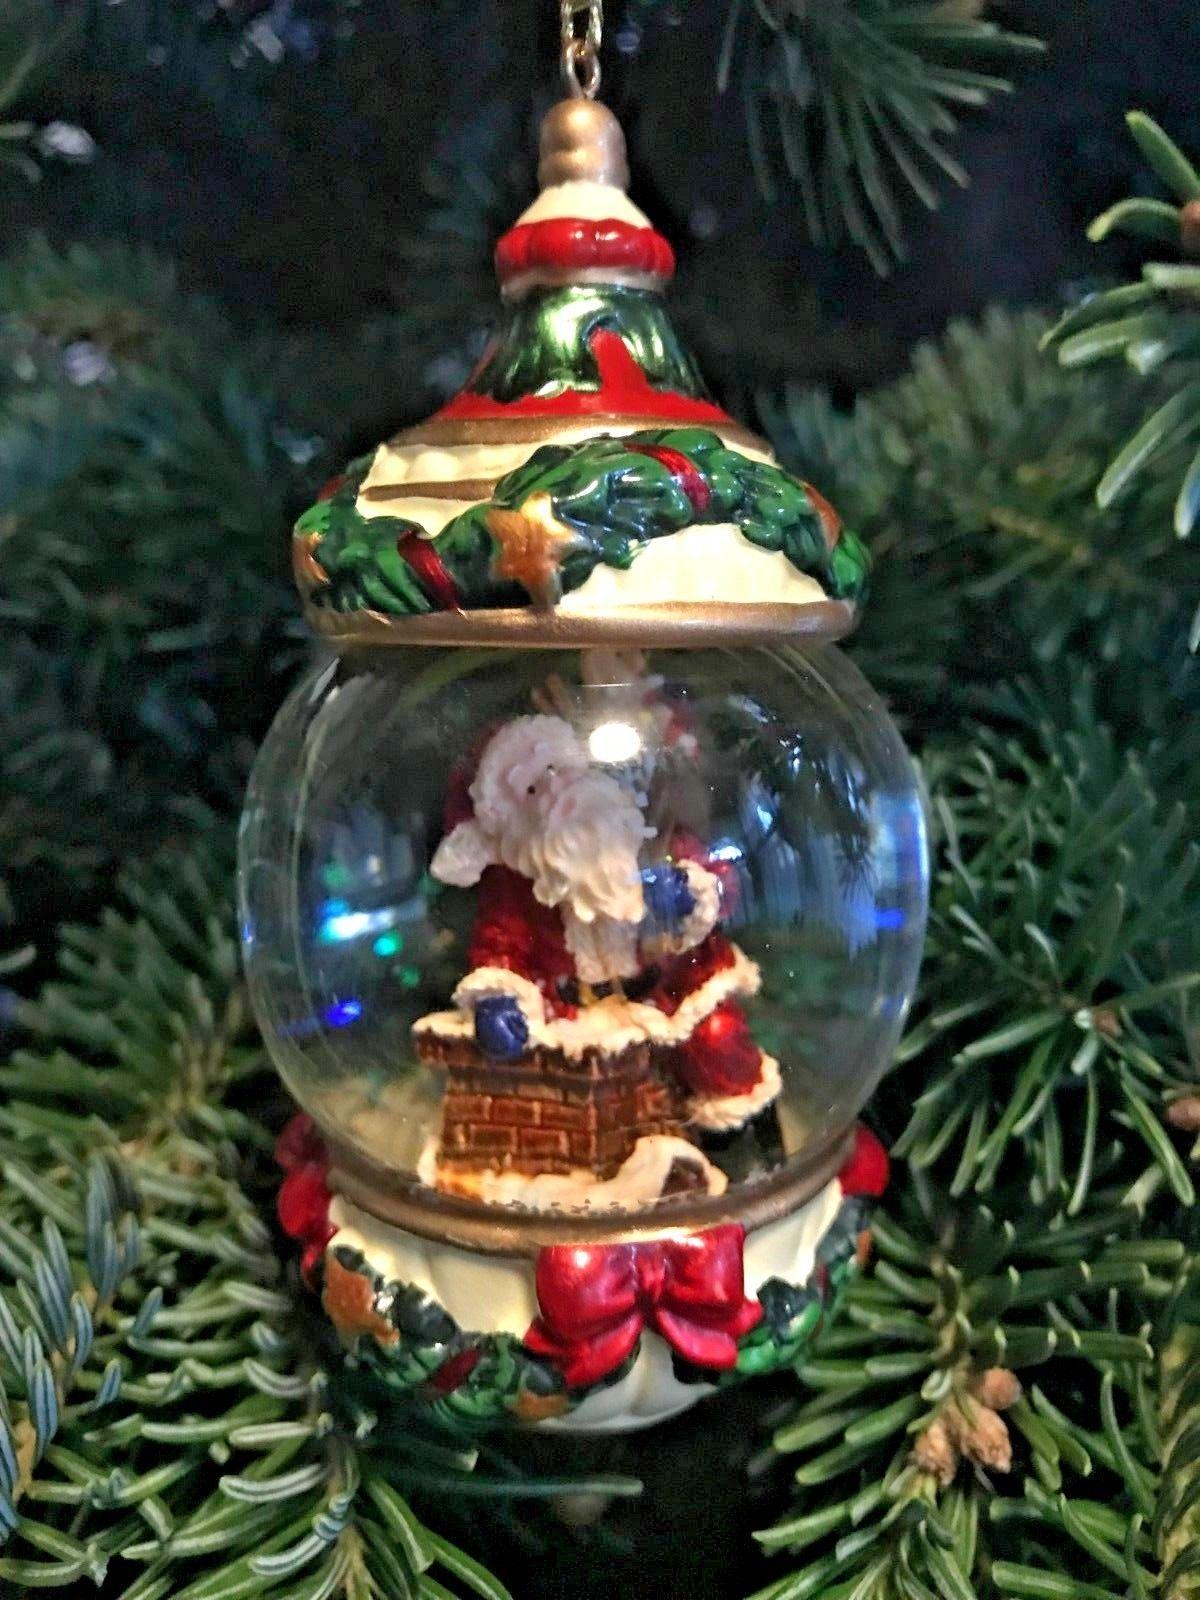 Costco KIRKLAND Signature Water Snow Globe Ornament